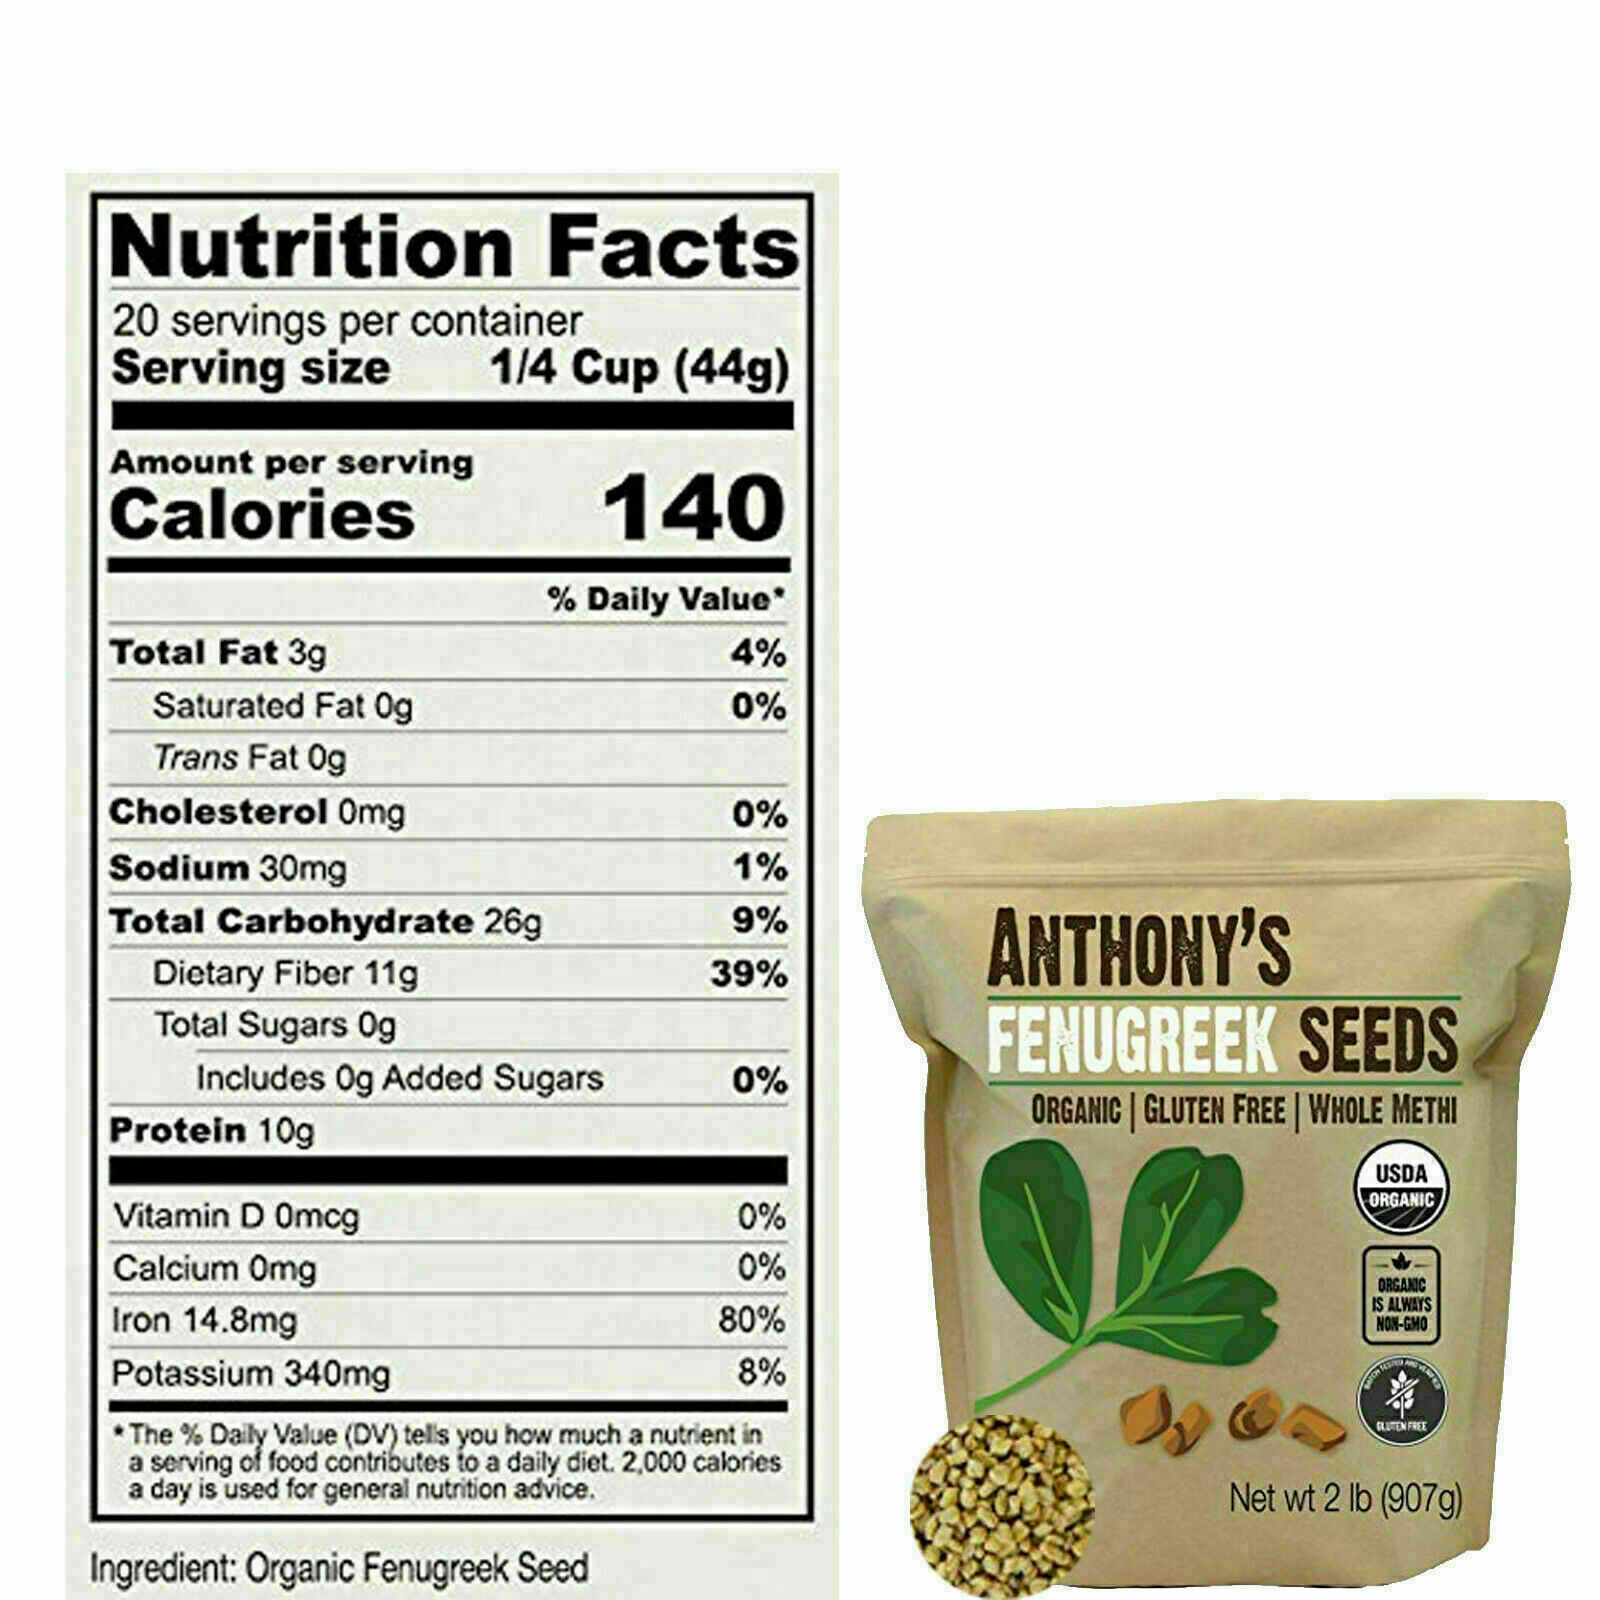 ORGANIC FENUGREEK SEEDS WHOLE METHI Seed Gluten Free Non GMO